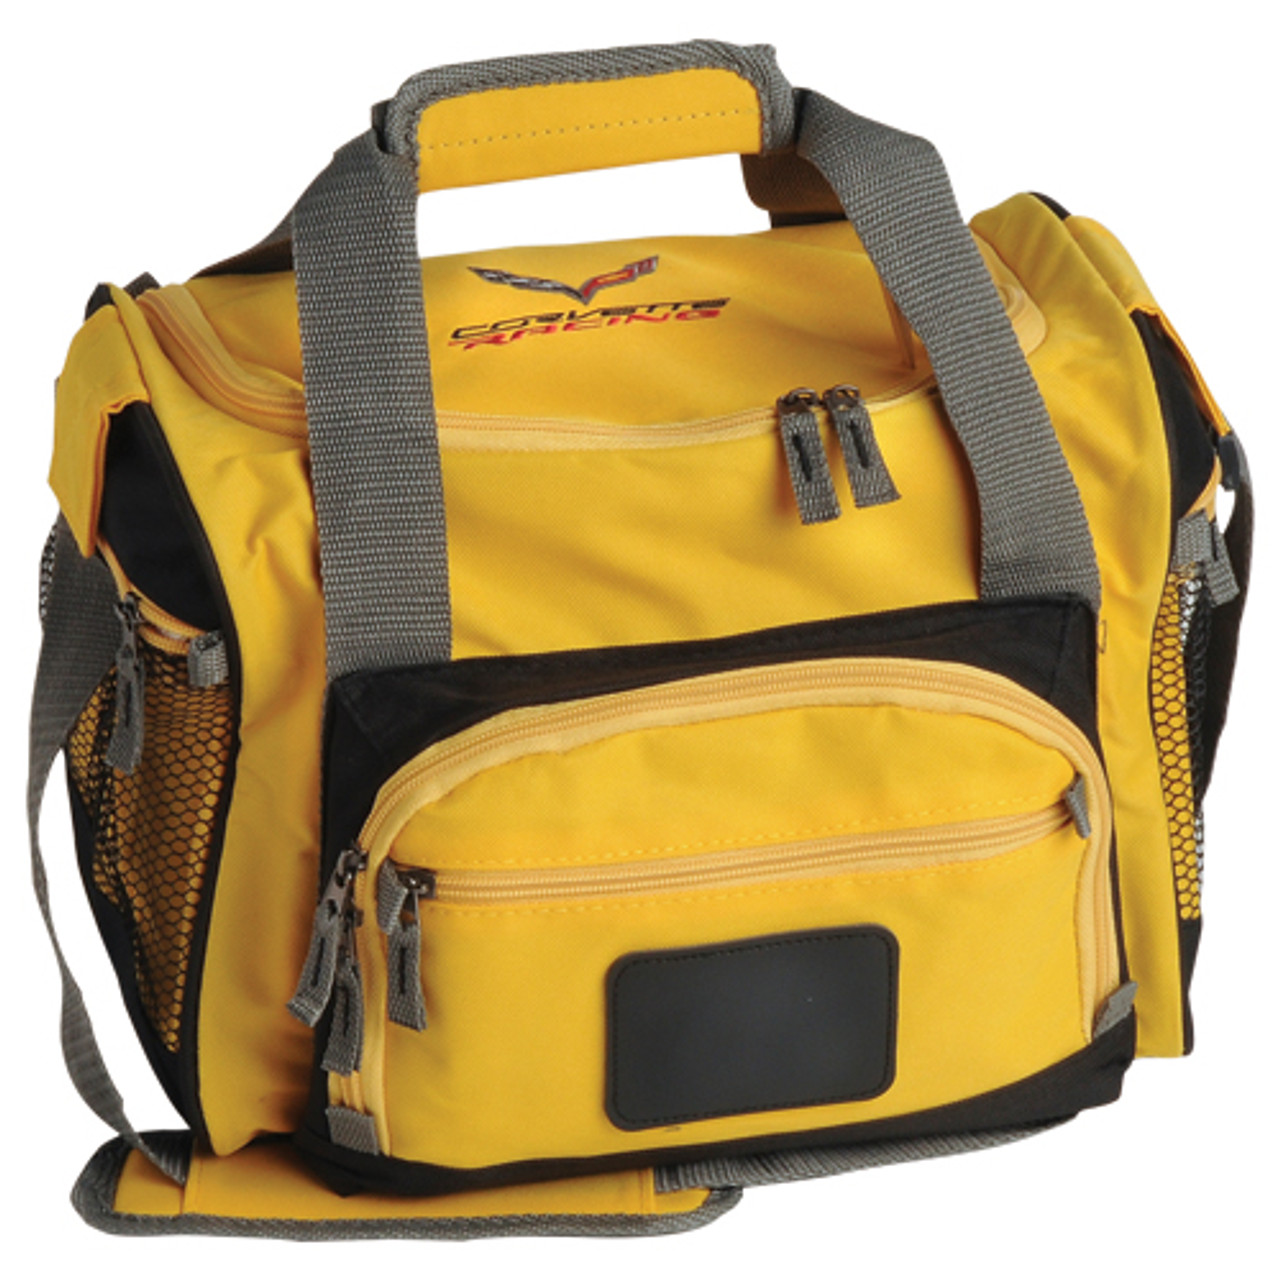 C7 Corvette Racing Yellow Cooler Bag